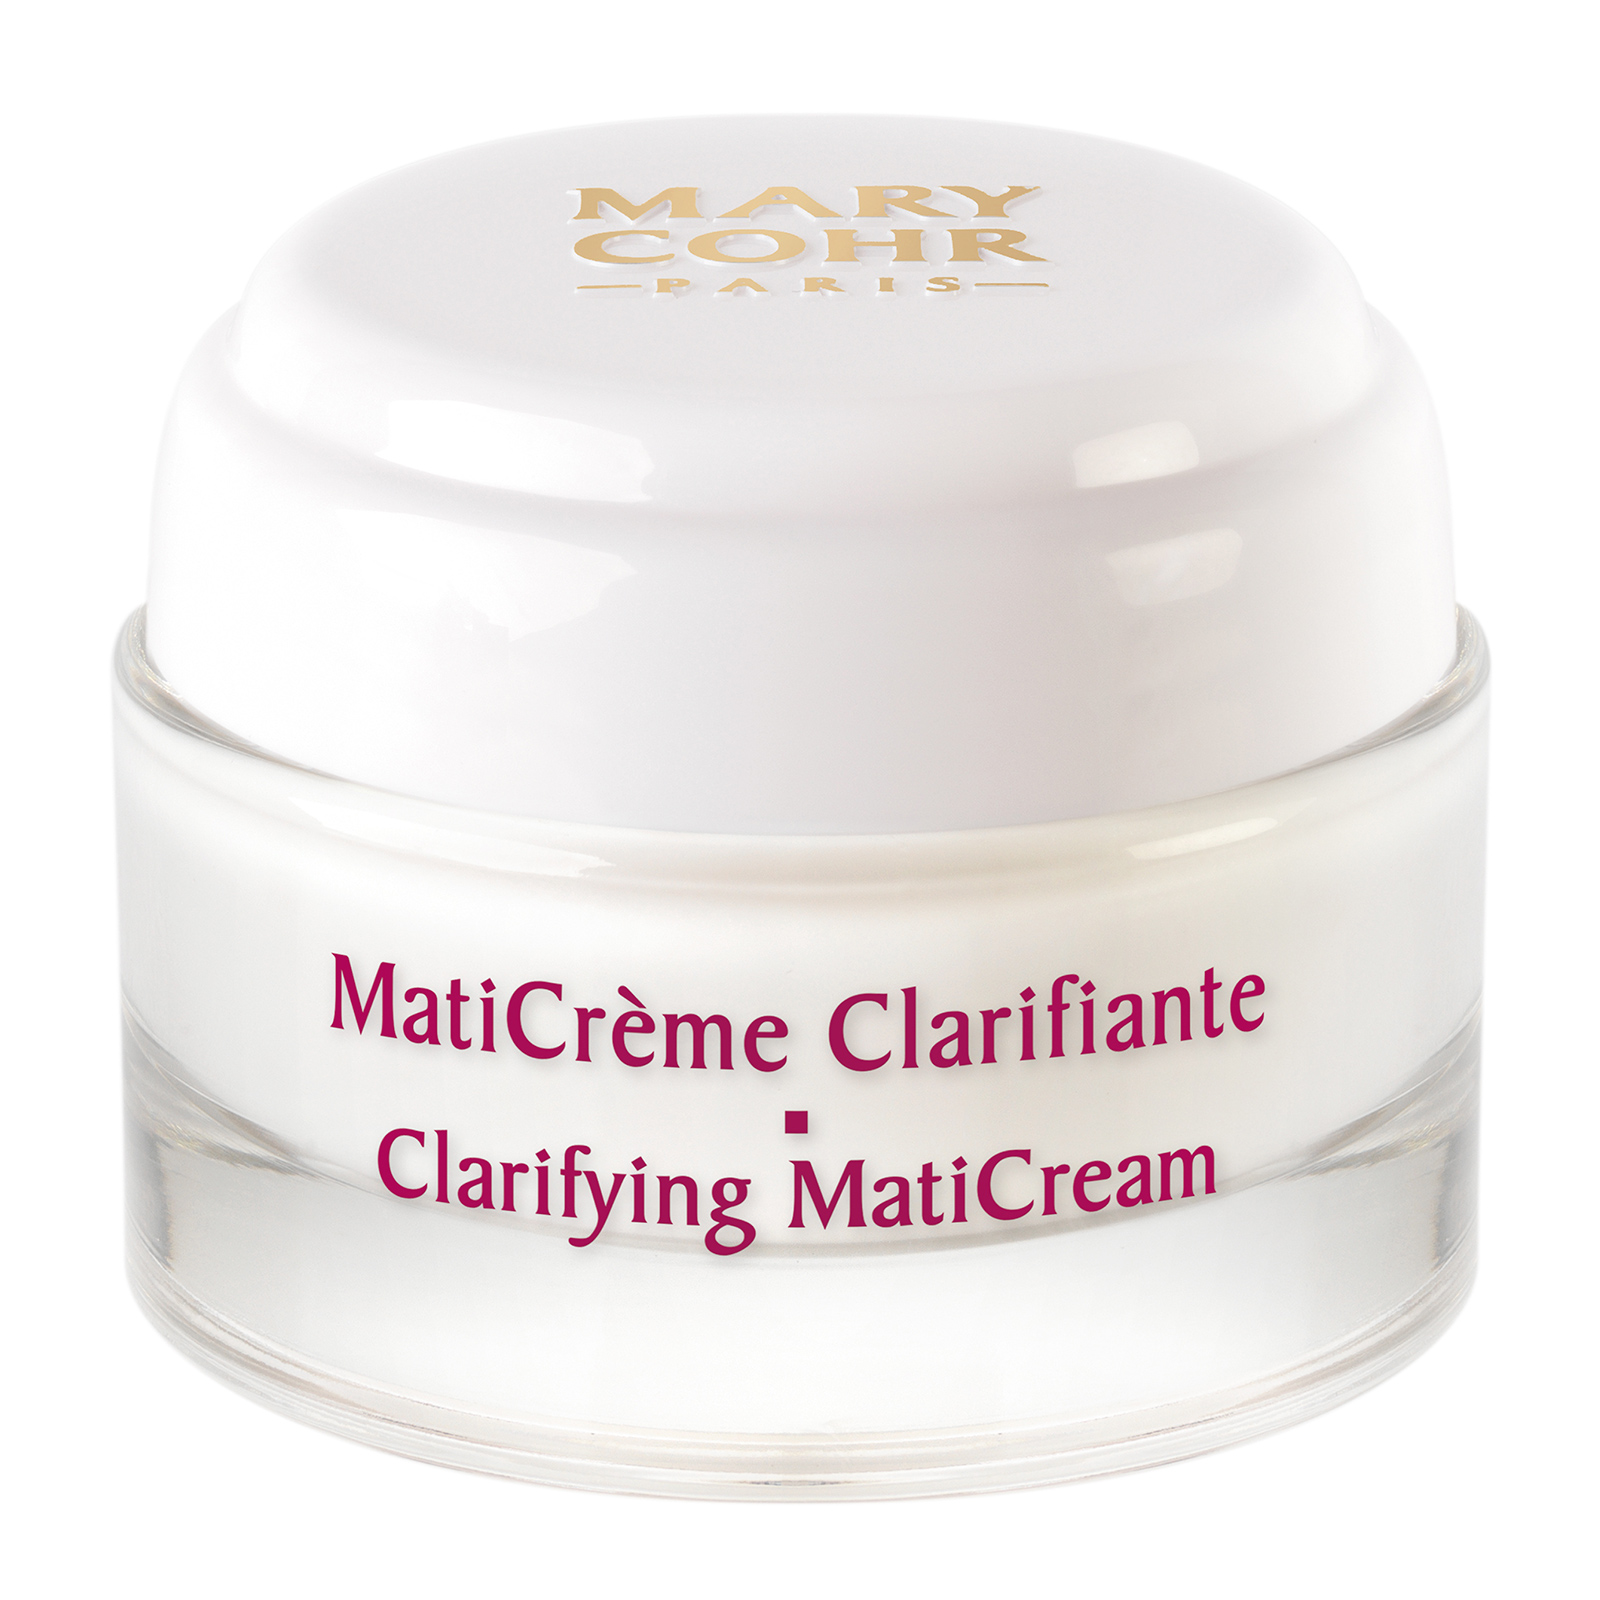 Maticrème Clarifiante 50ml